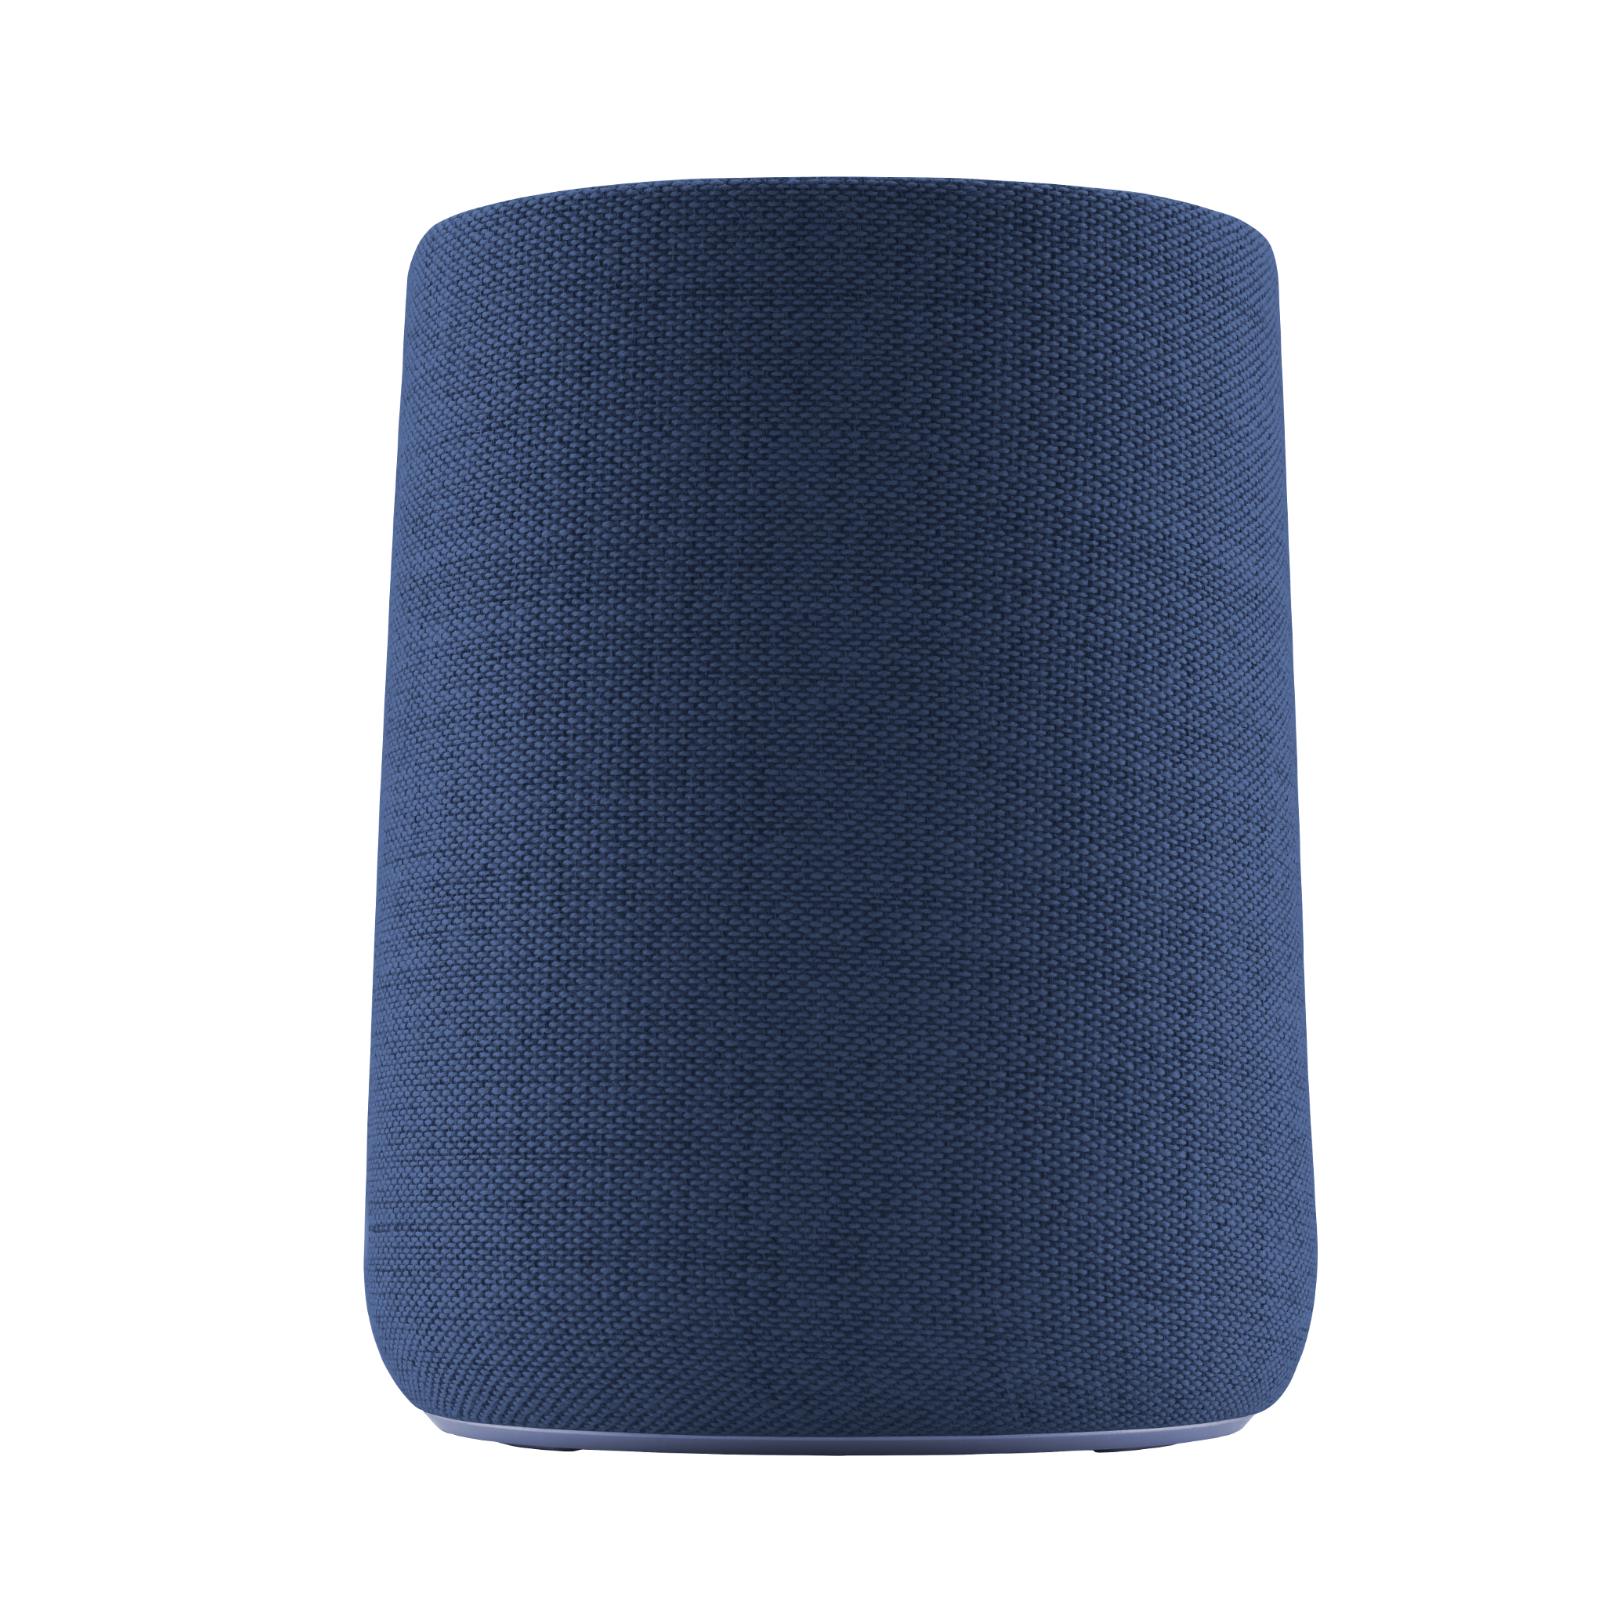 Harman Kardon Citation One MKII - Blue - All-in-one smart speaker with room-filling sound - Left